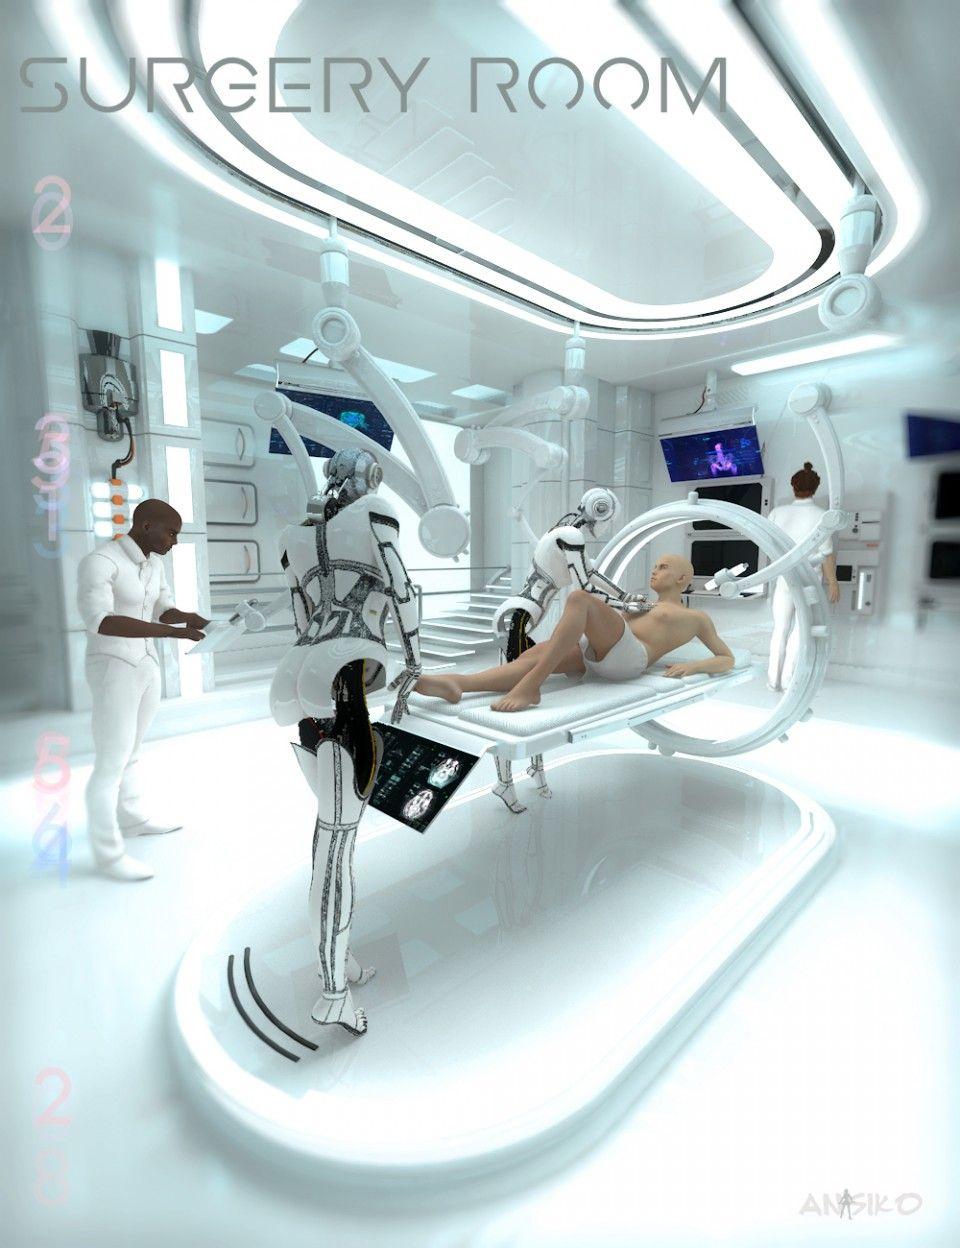 Hospital Procedure Room: Sci-fi Surgery Room